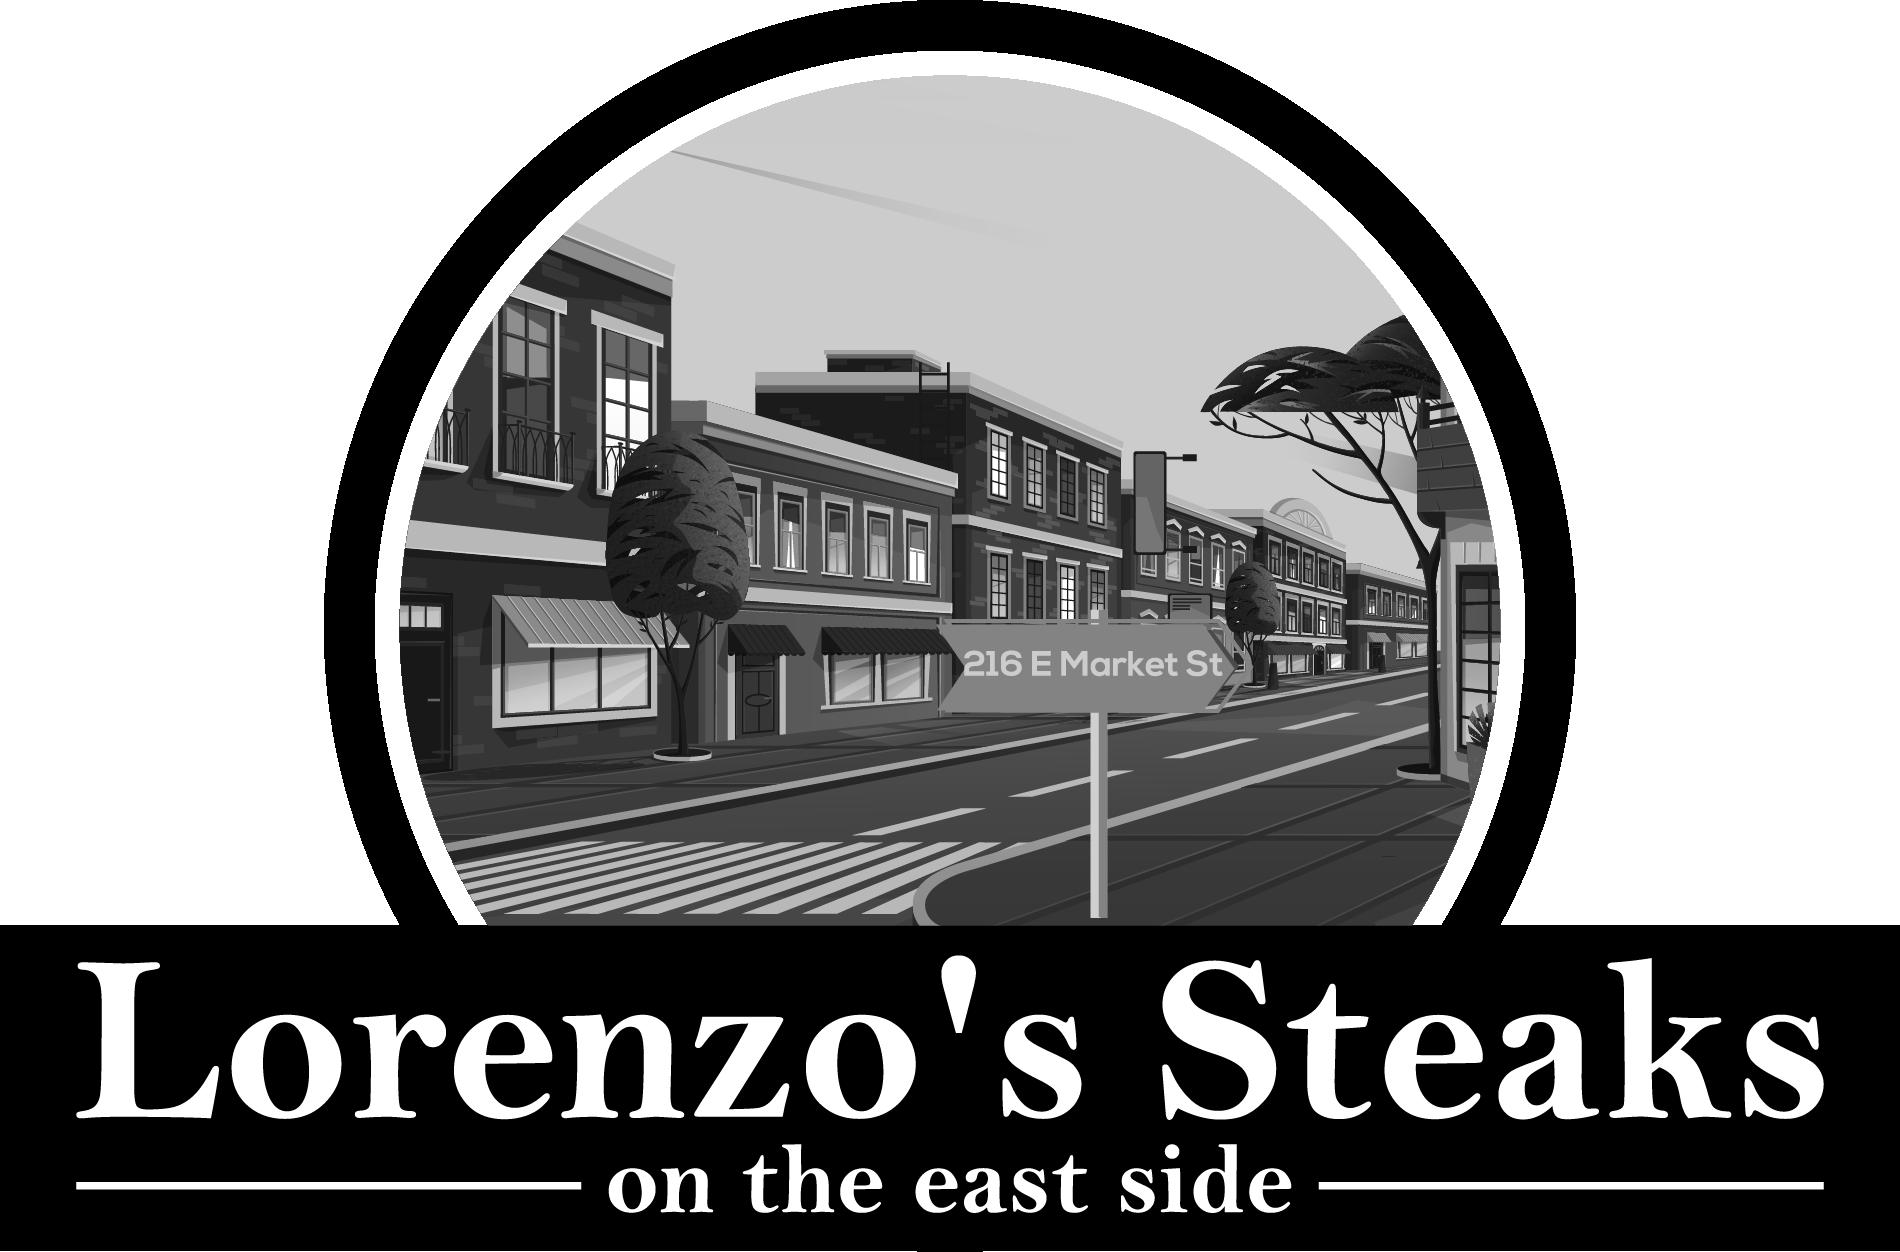 Lorenzos Steaks